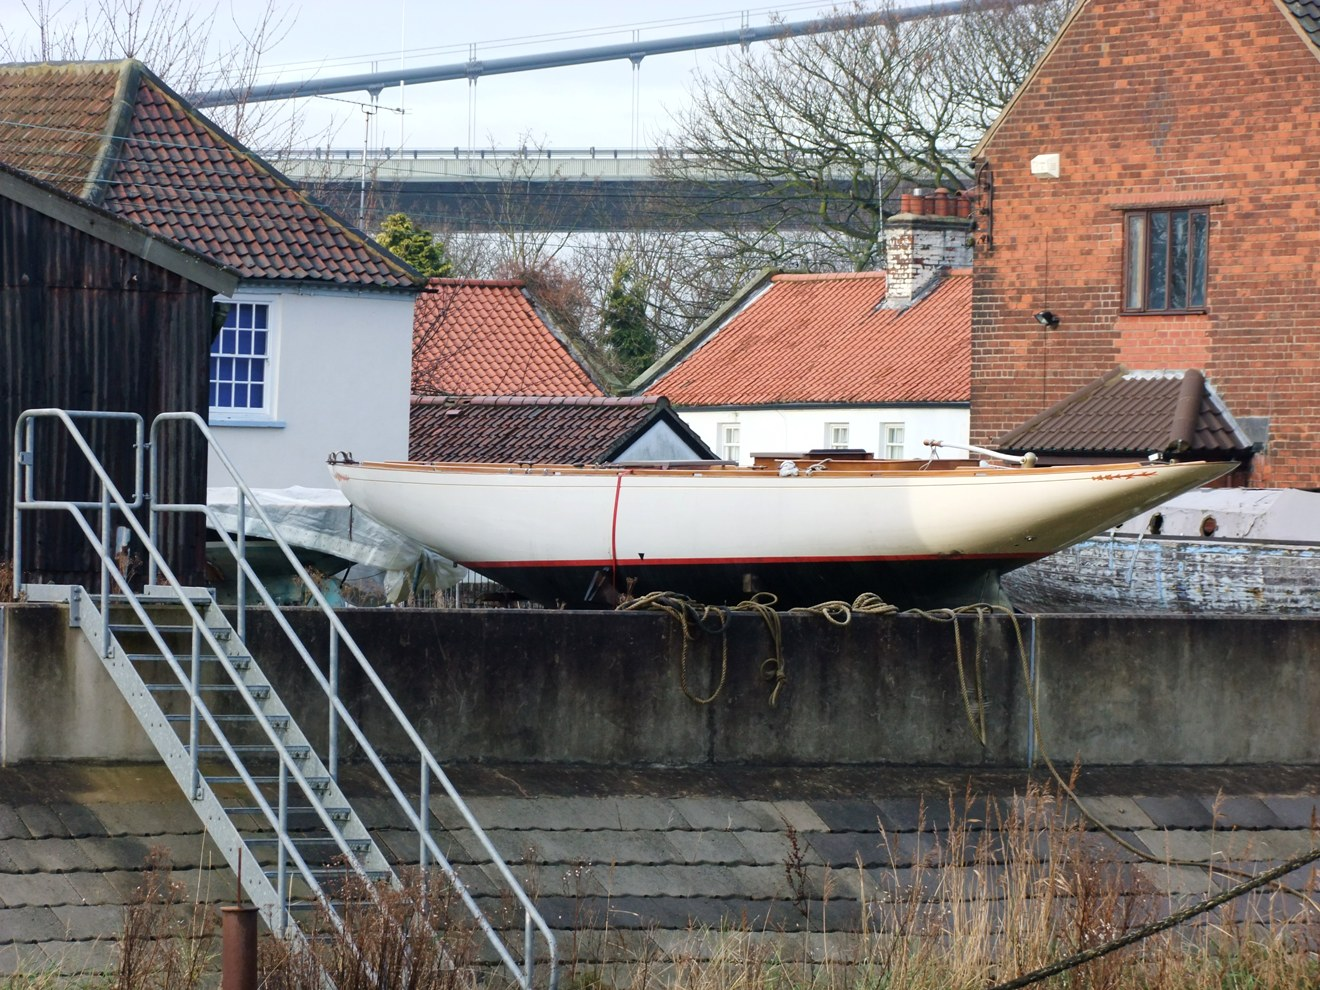 Keadby Lock Alkborough Barton on Humber and Caistor 26